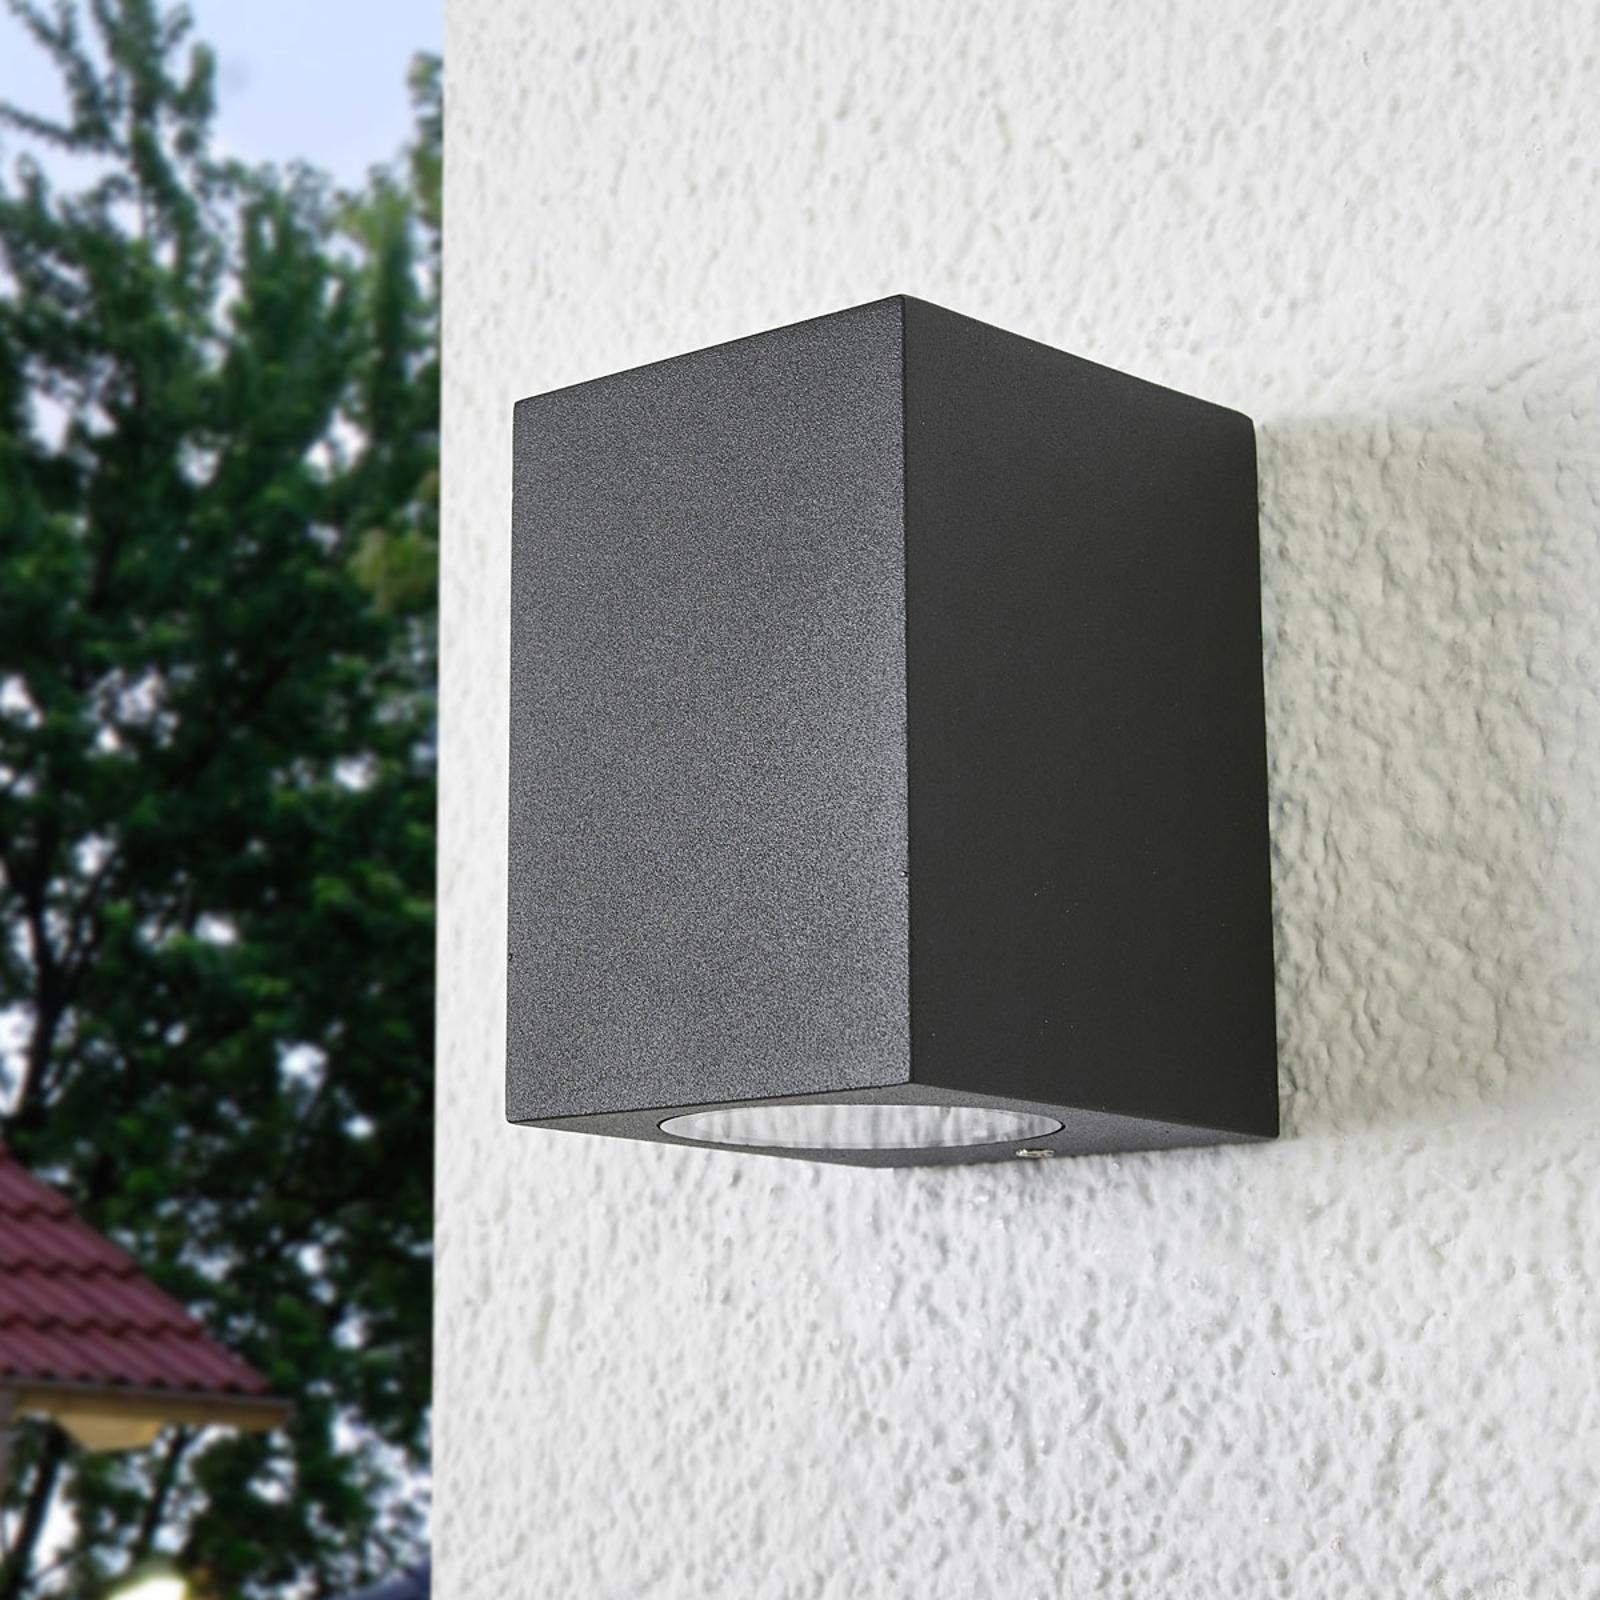 Utendørs Maurice halogen vegglampe, IP54 | Lampegiganten.no